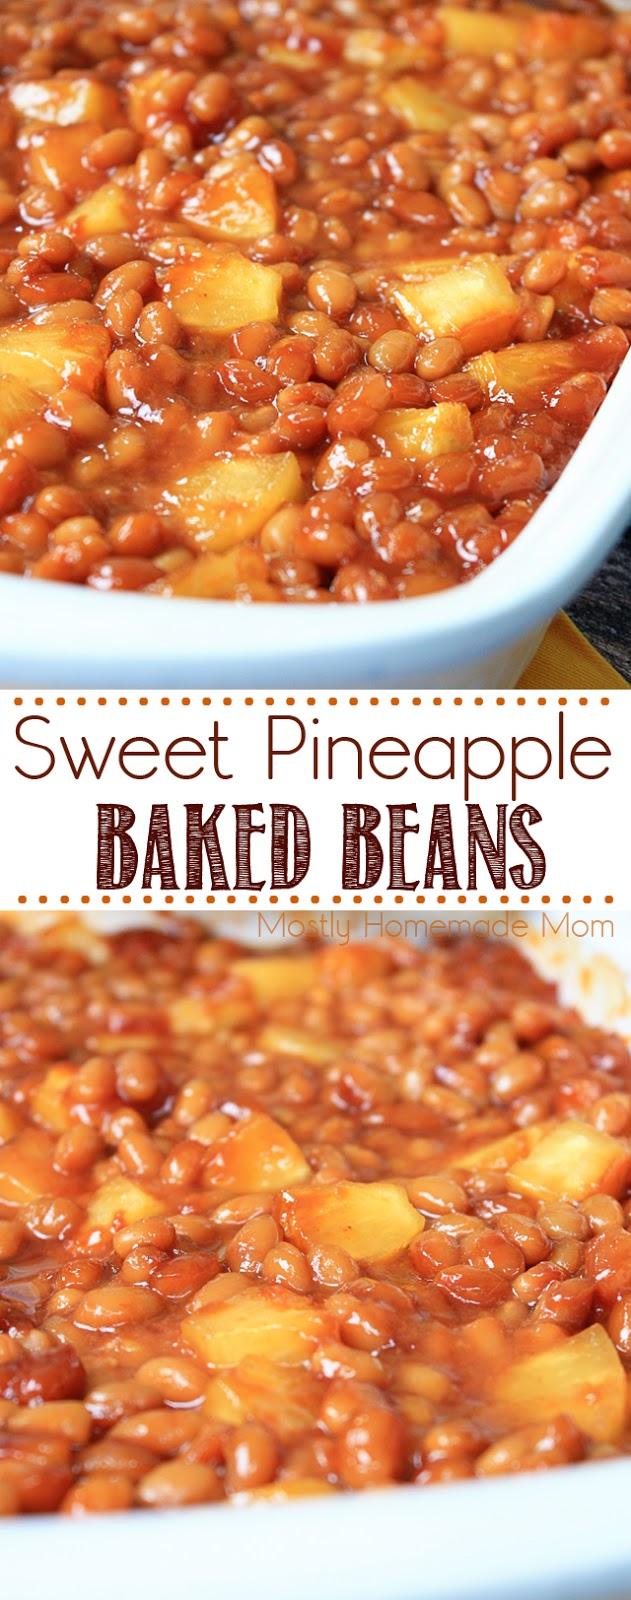 Sweet Pineapple Baked Beans recipe